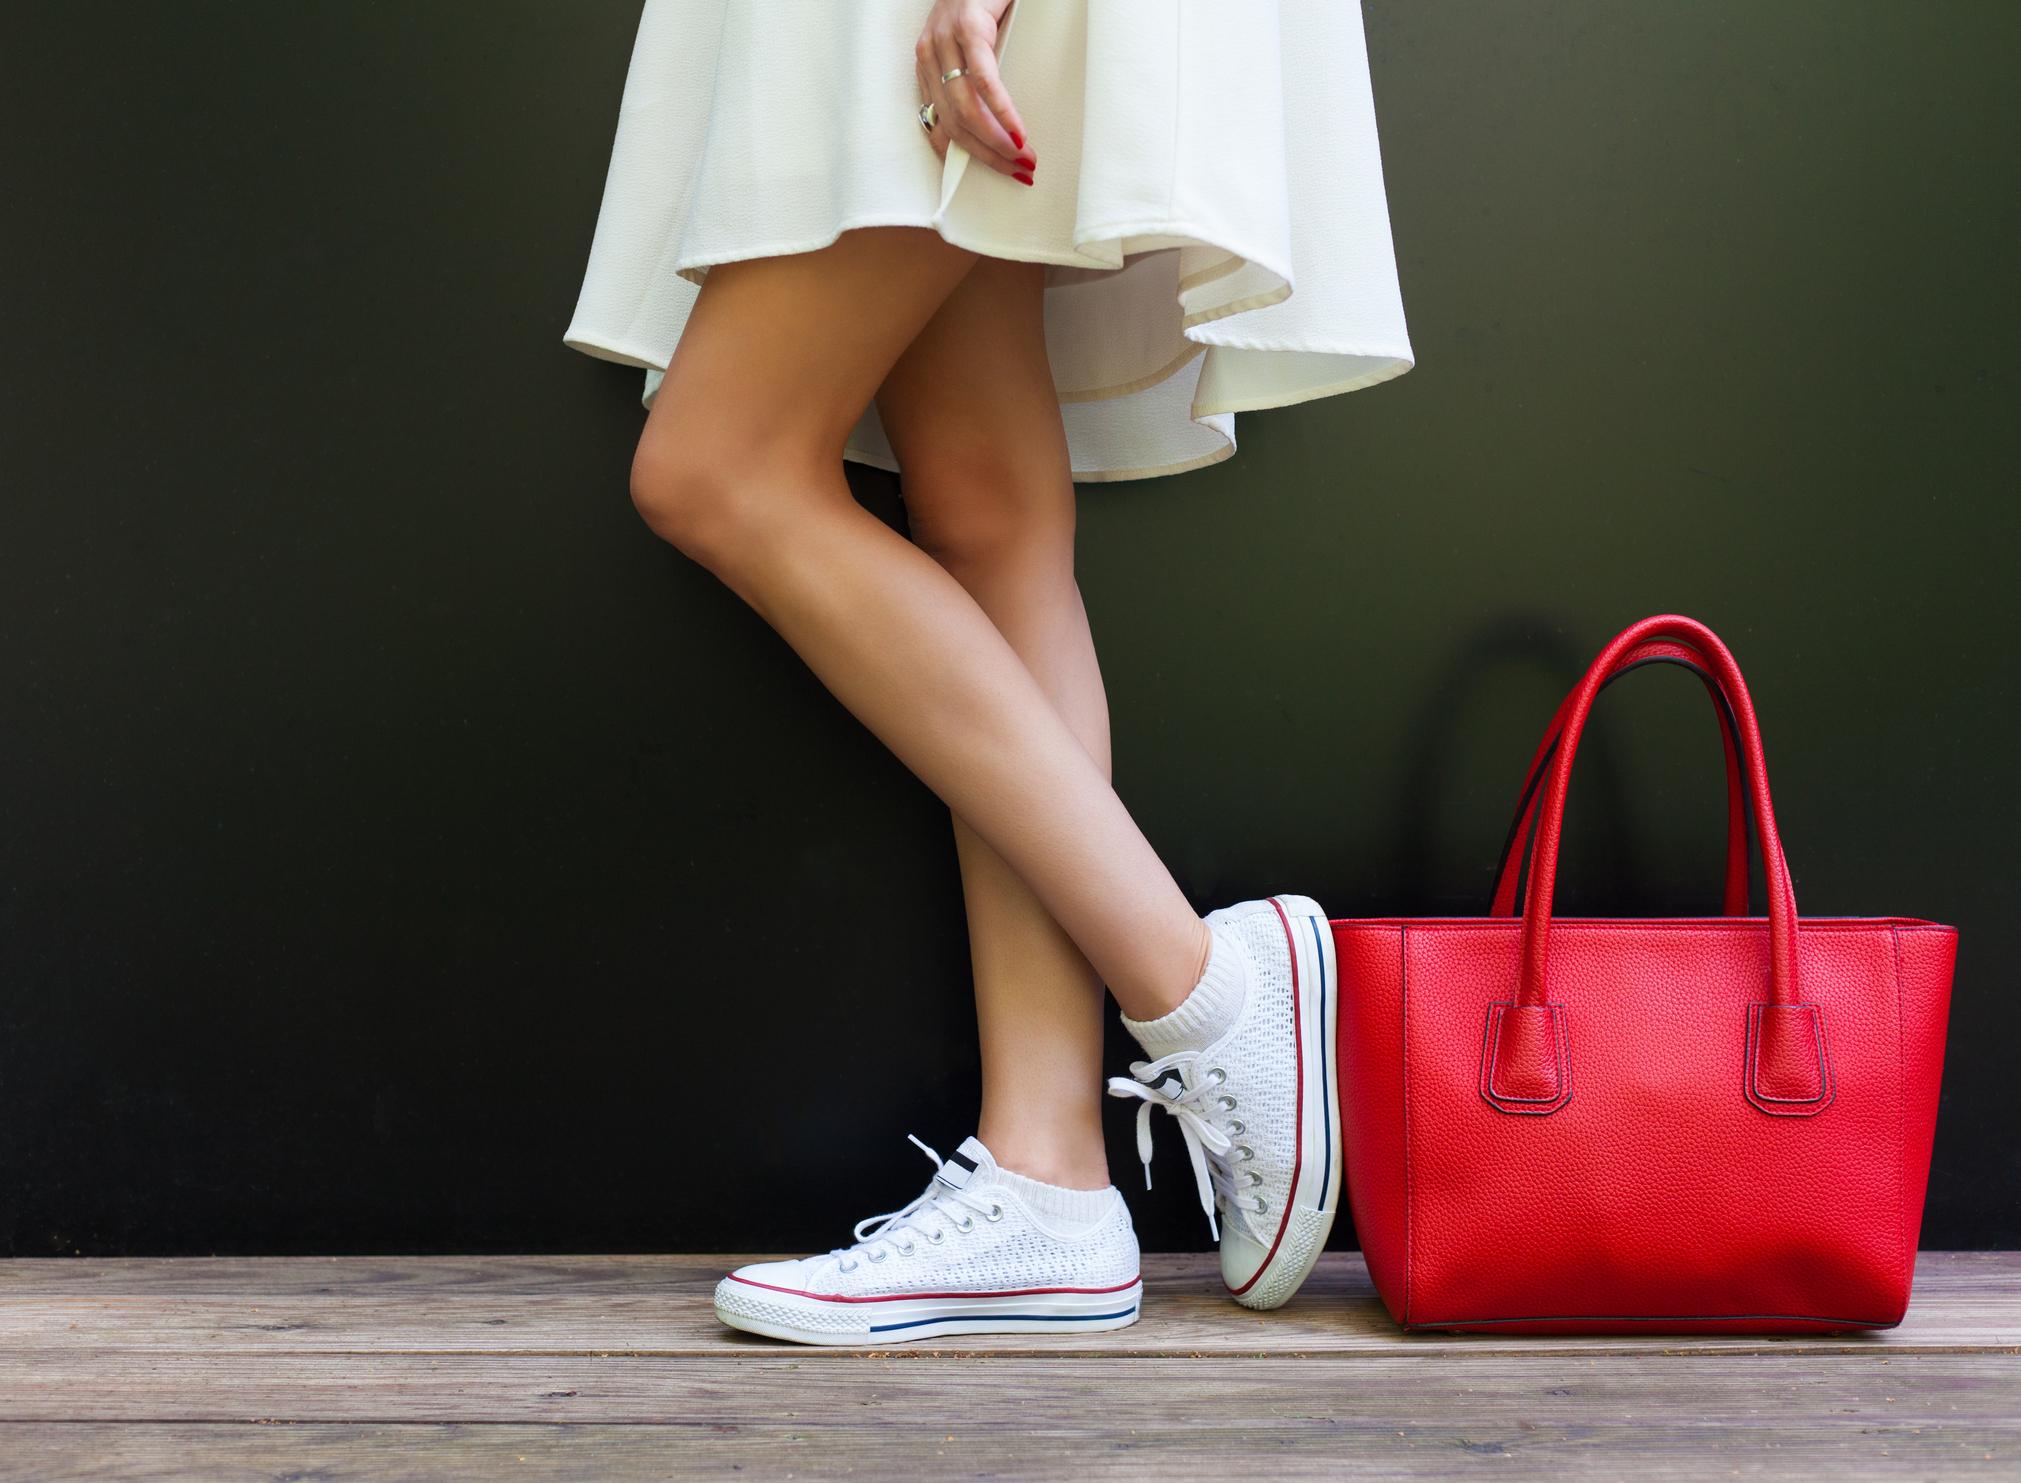 a1243dd4b0a8 Πώς να καθαρίσεις τα λευκά sneakers σου εύκολα και γρήγορα